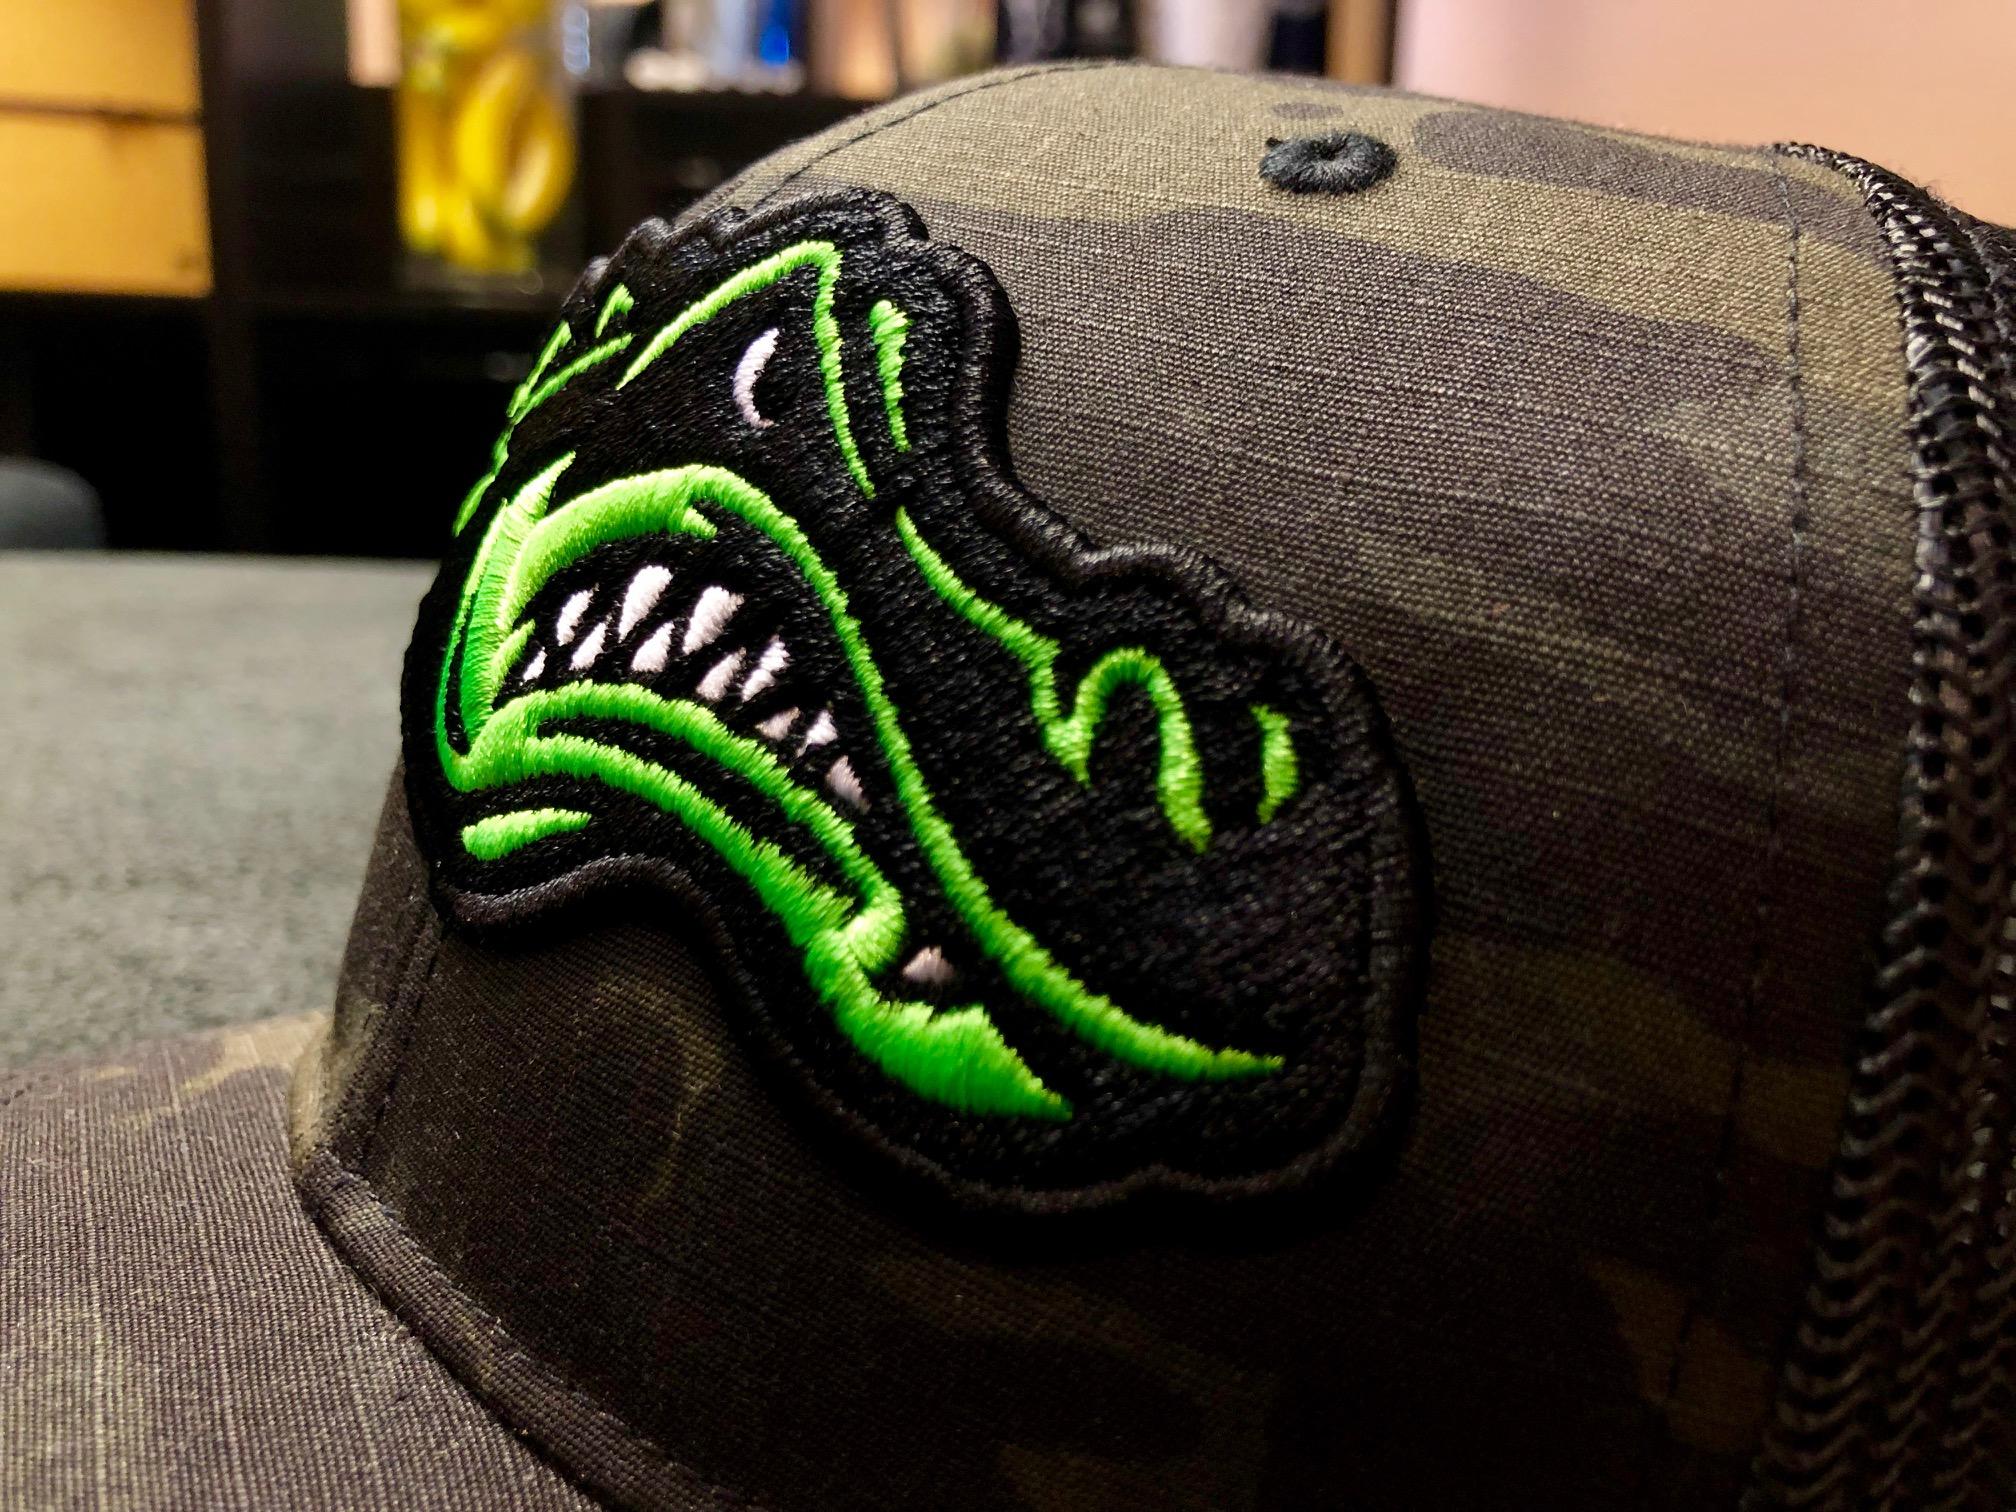 logounltd_laser_etching_embroidery_screen_printing_apparel_uniform_custom_tshirts_kirkland_bellevue_seattle_redmond_woodinville_branded_merchandise_promotional_products_logo_unltd_green_river_college_hat (6).jpg